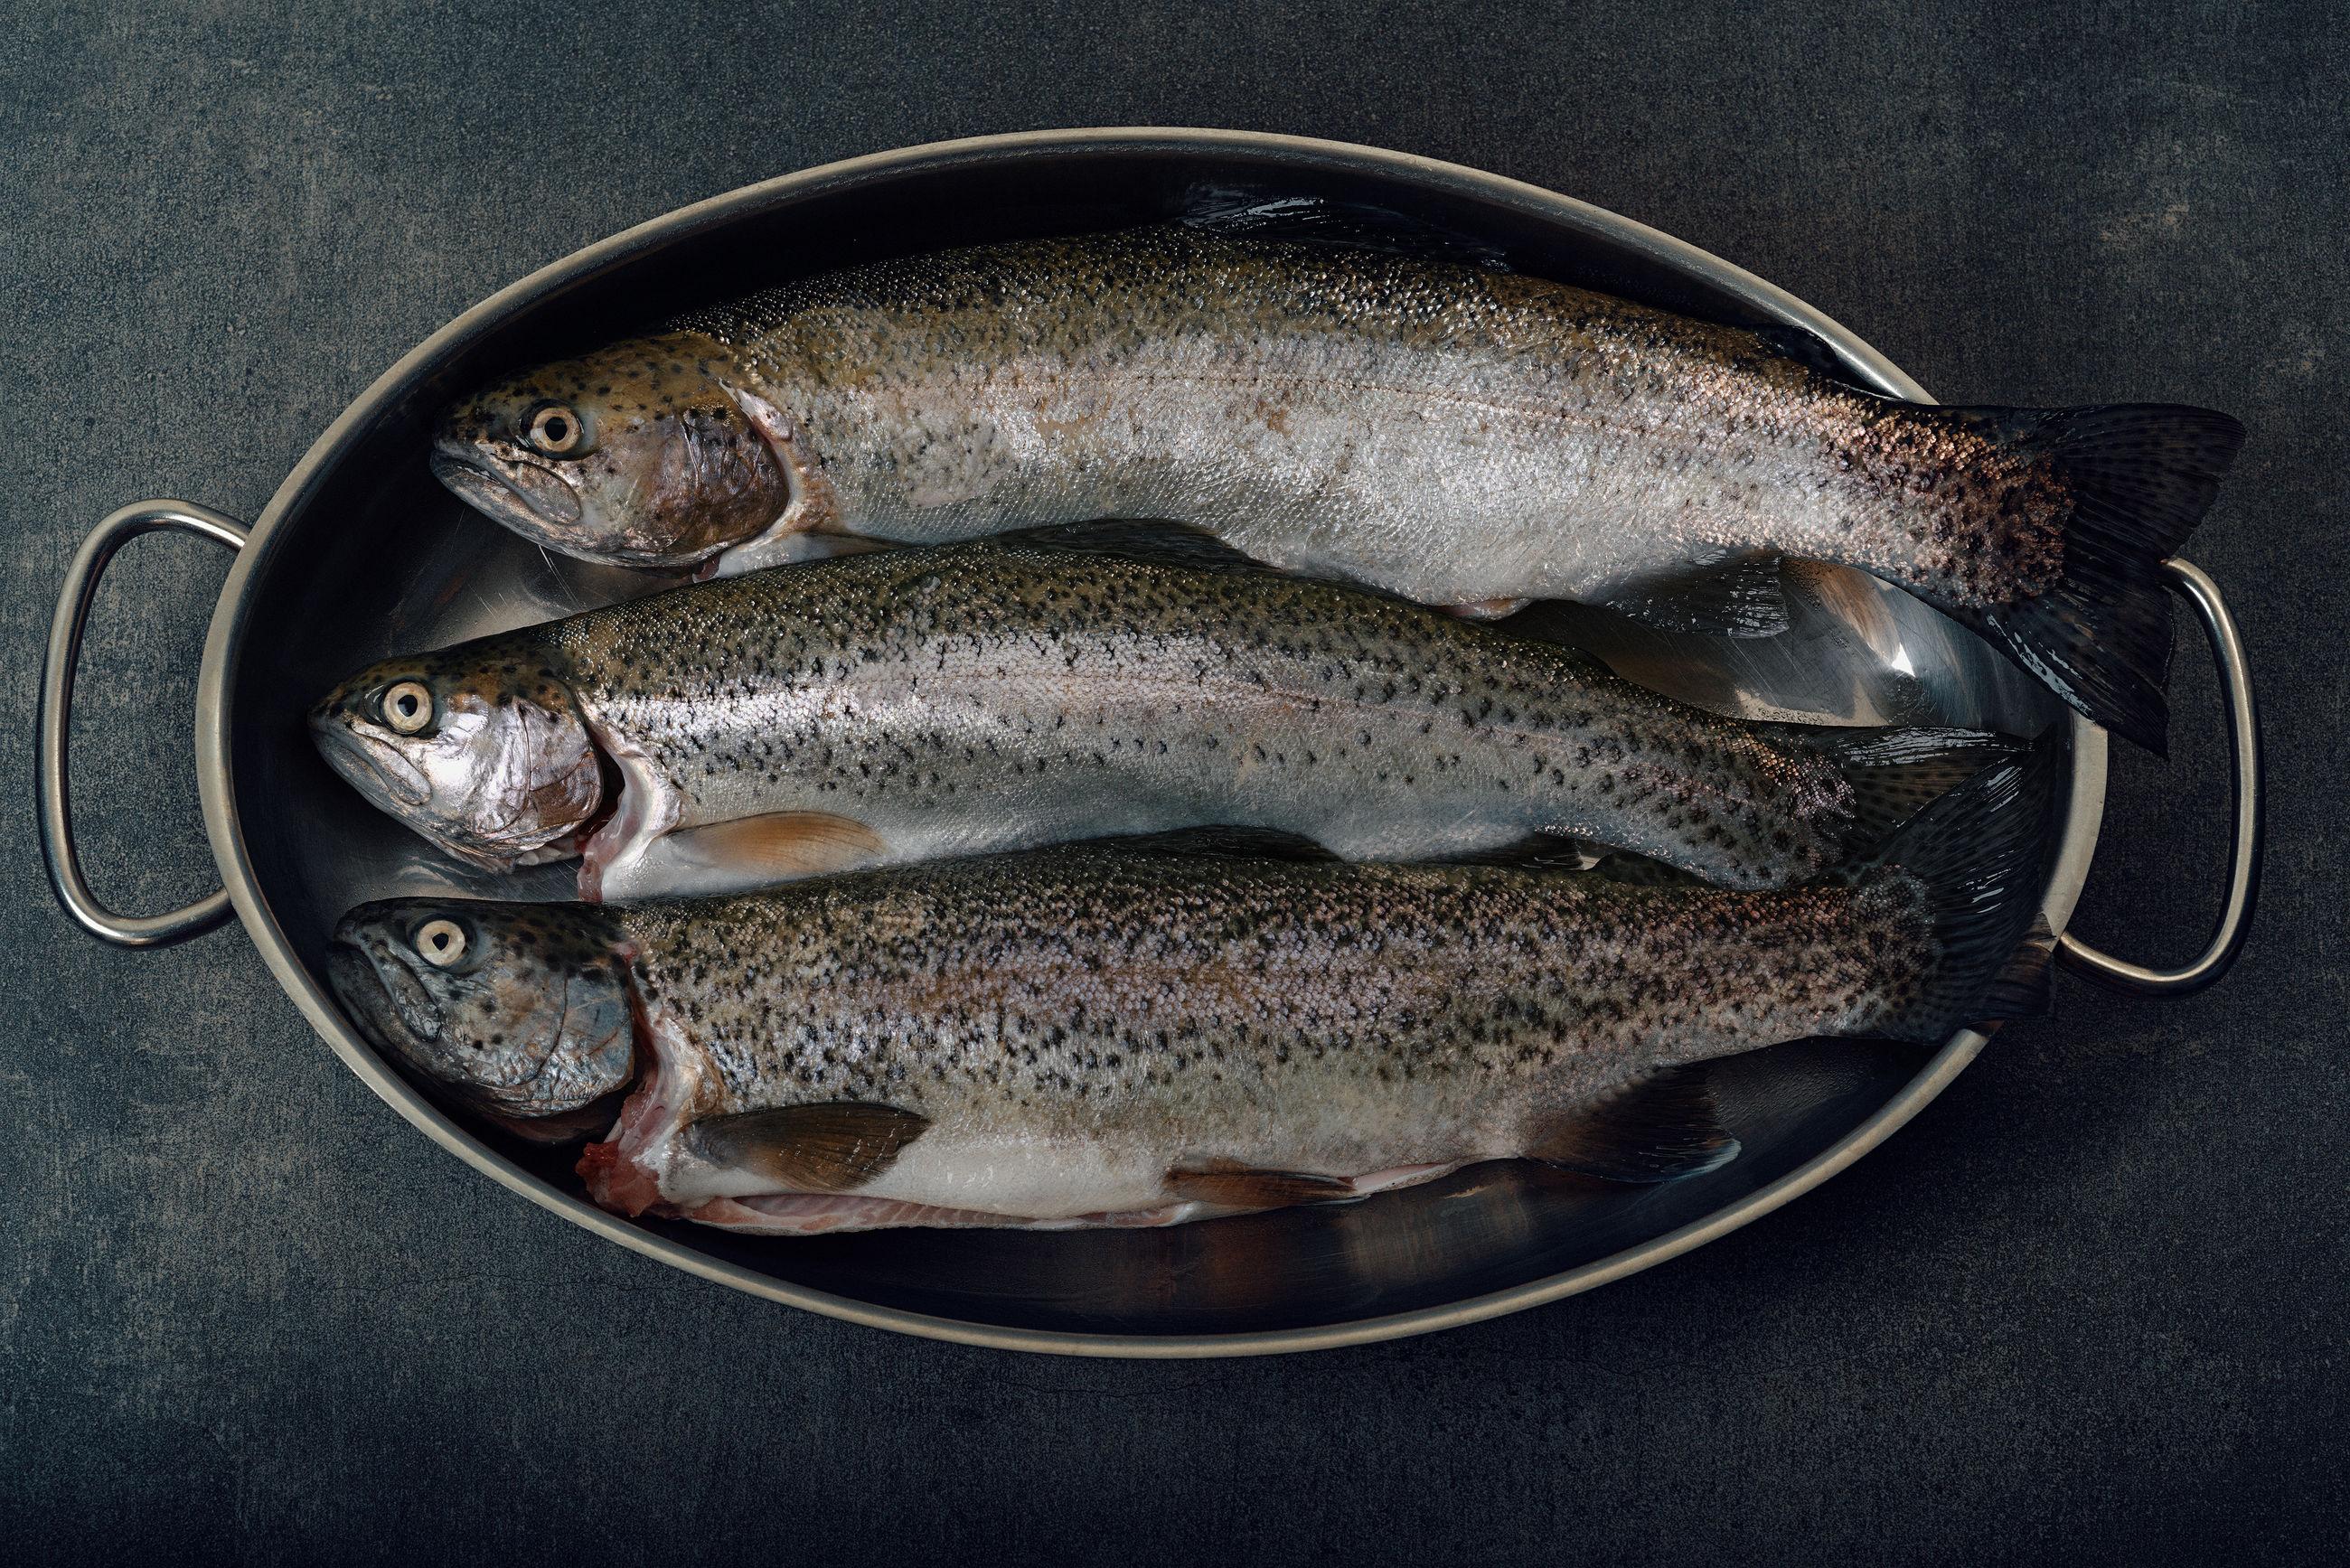 Three fish in a pan